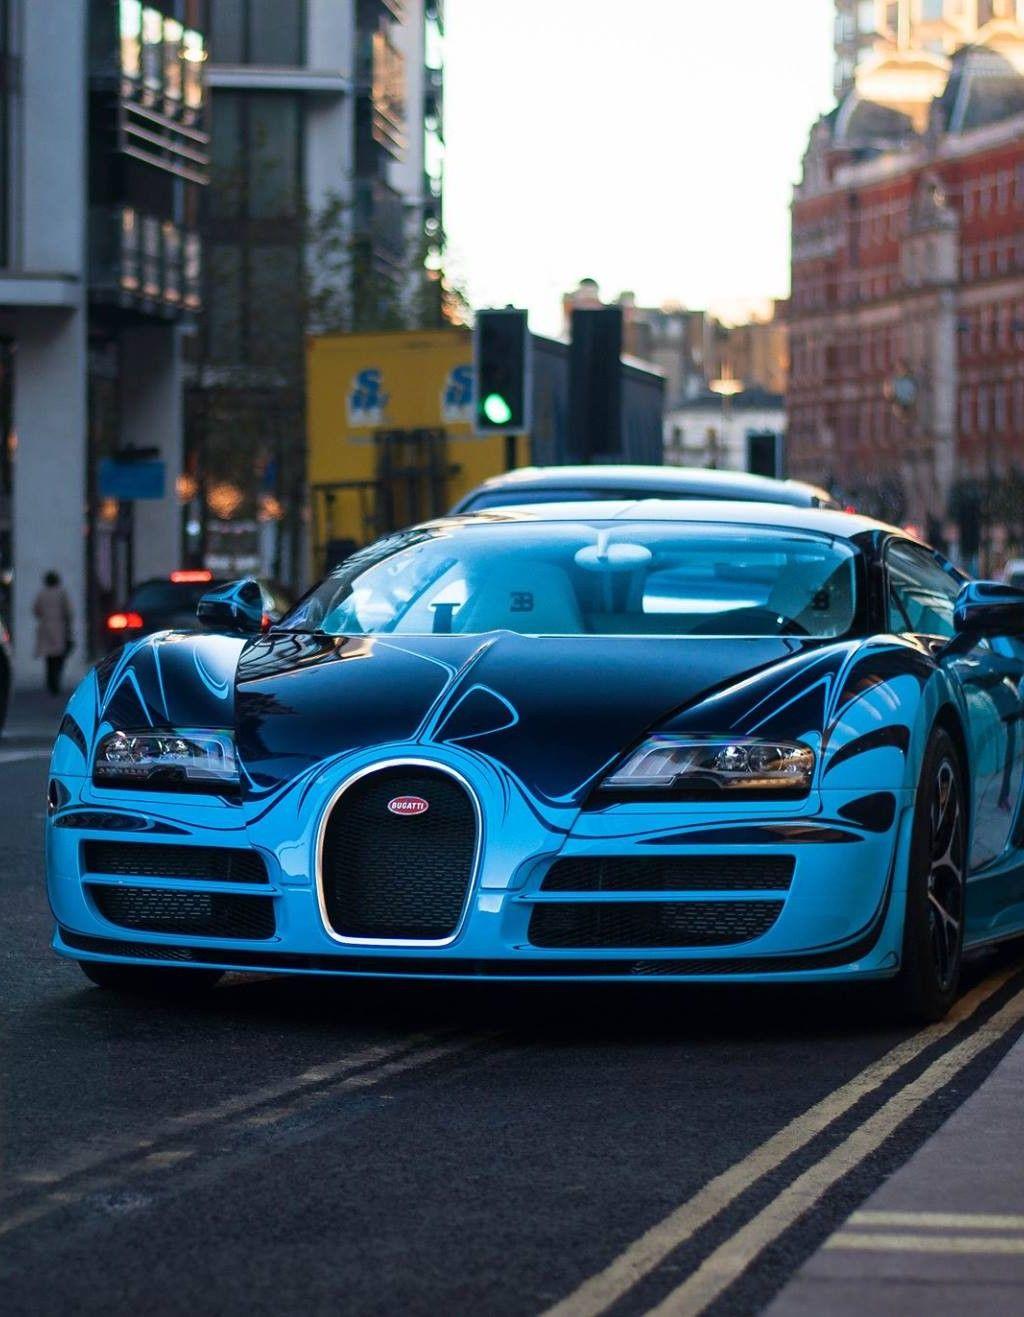 The Outrageous Bugatti Veyron Vehicule De Luxe Bugatti Veyron